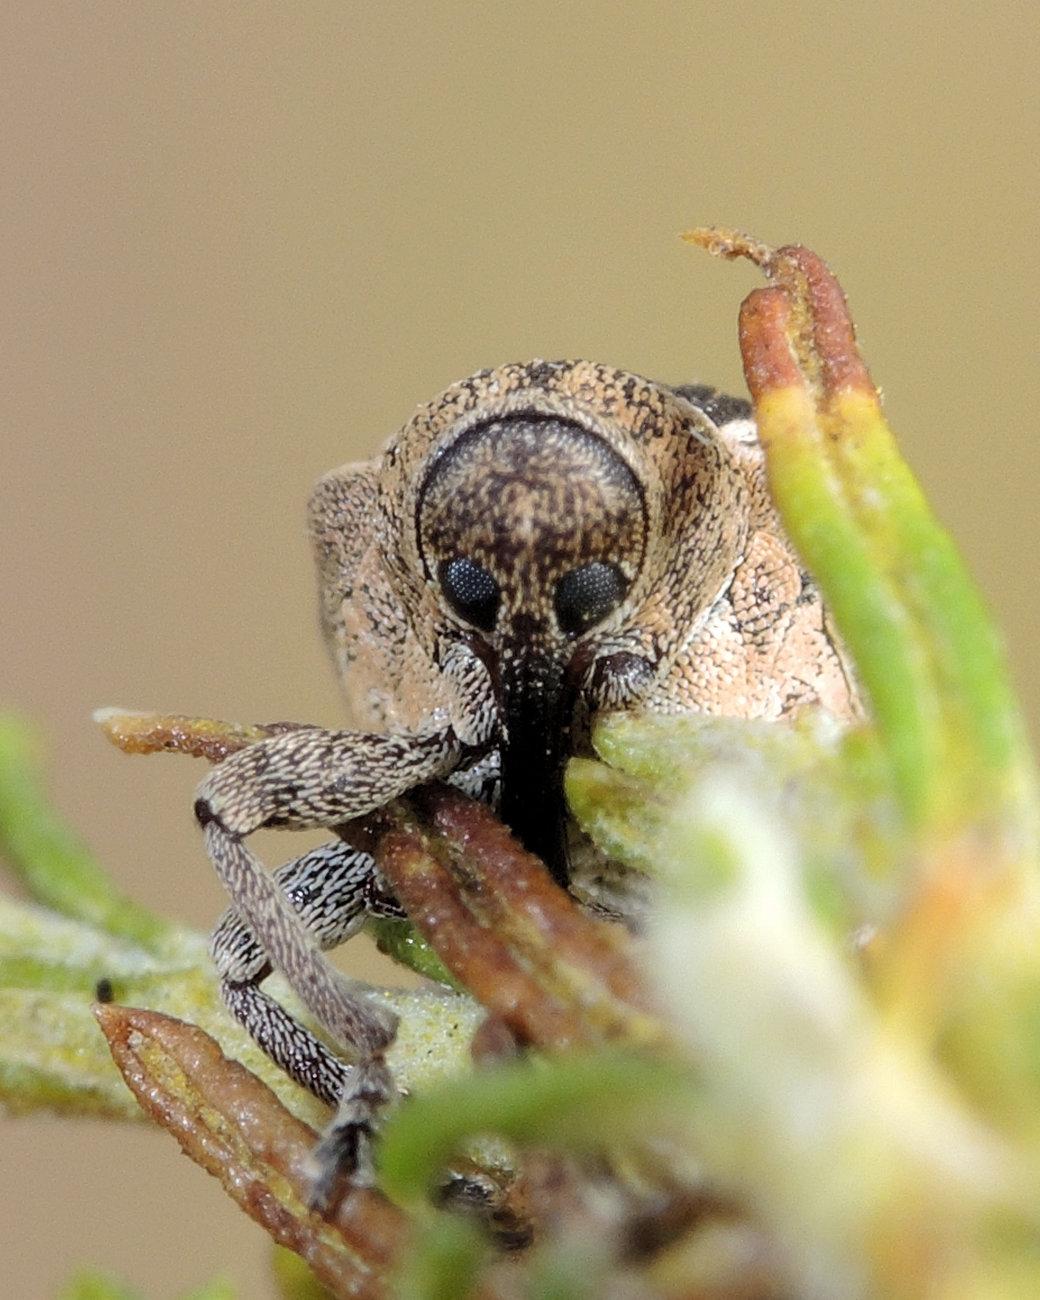 weevil (approx 6mil)